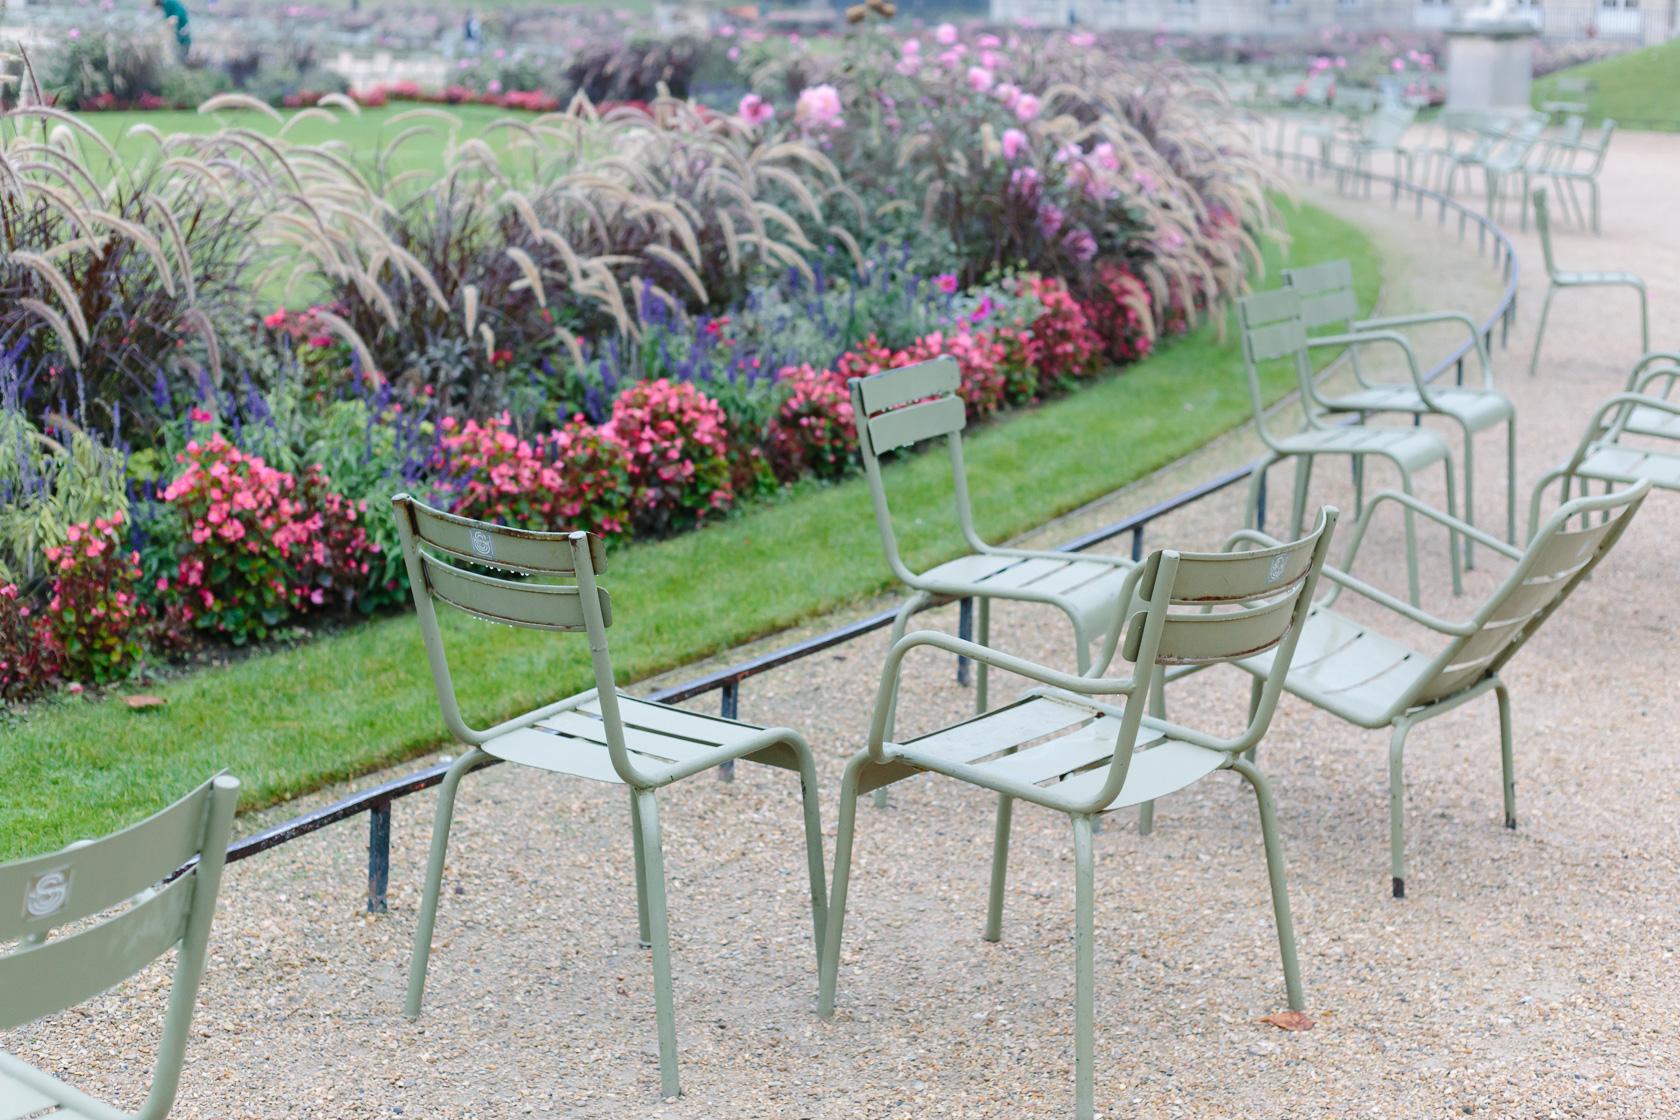 jardin-du-luxembourg-paris-4883